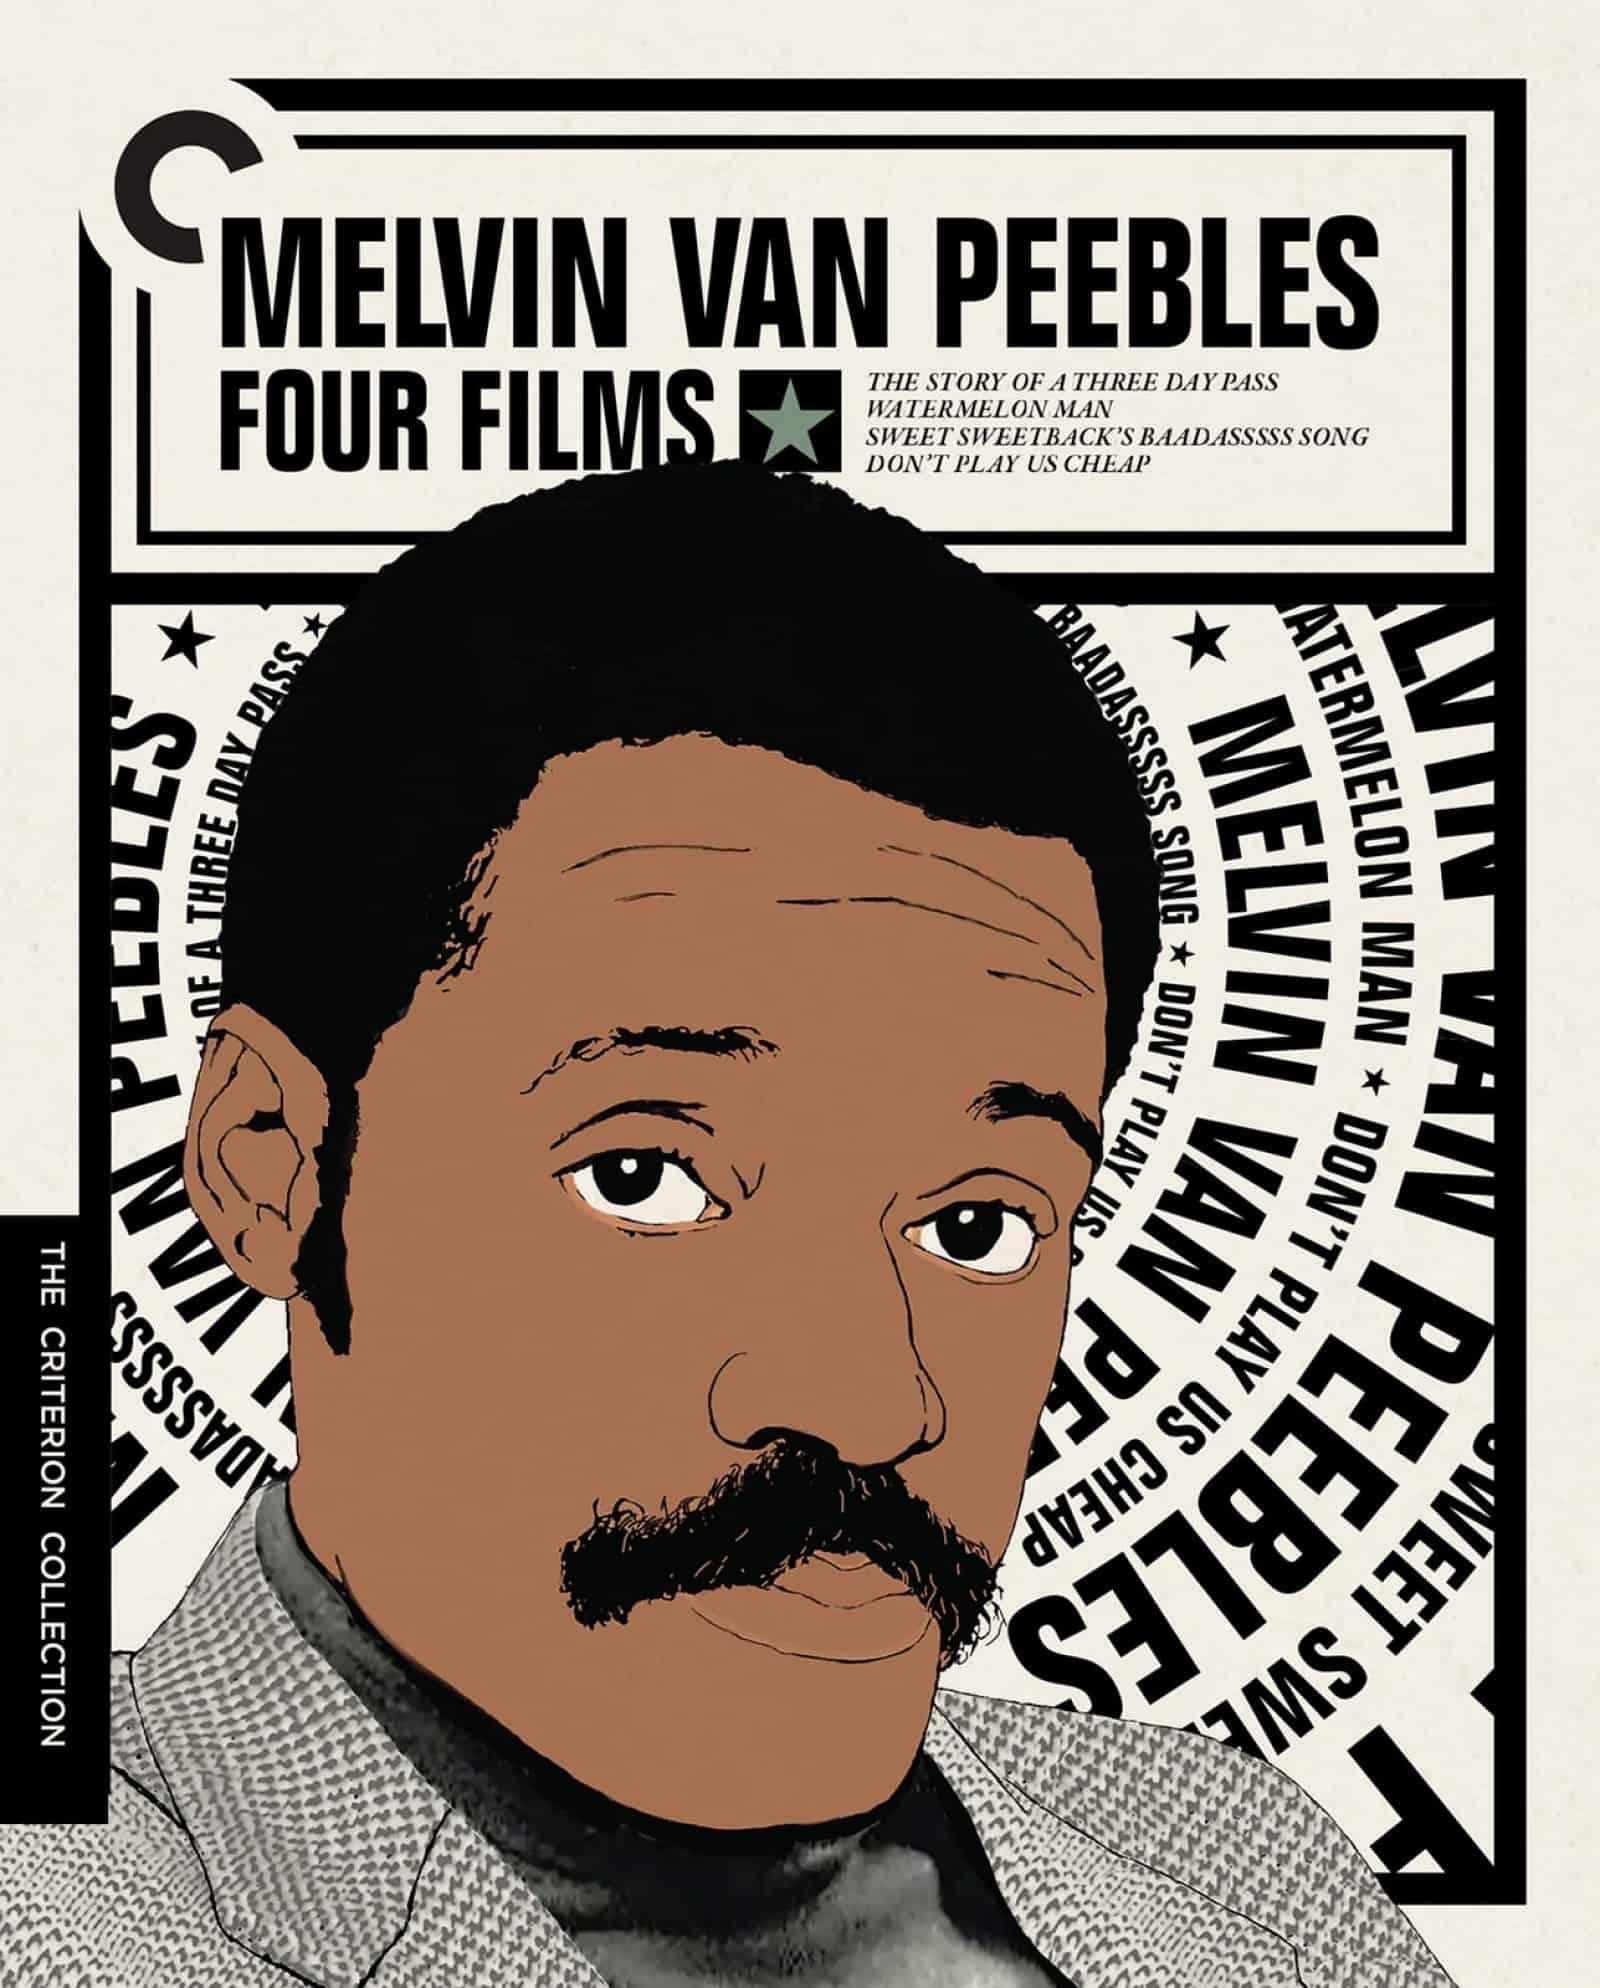 Melvin Van Peebles Four Films Blu ray Cover